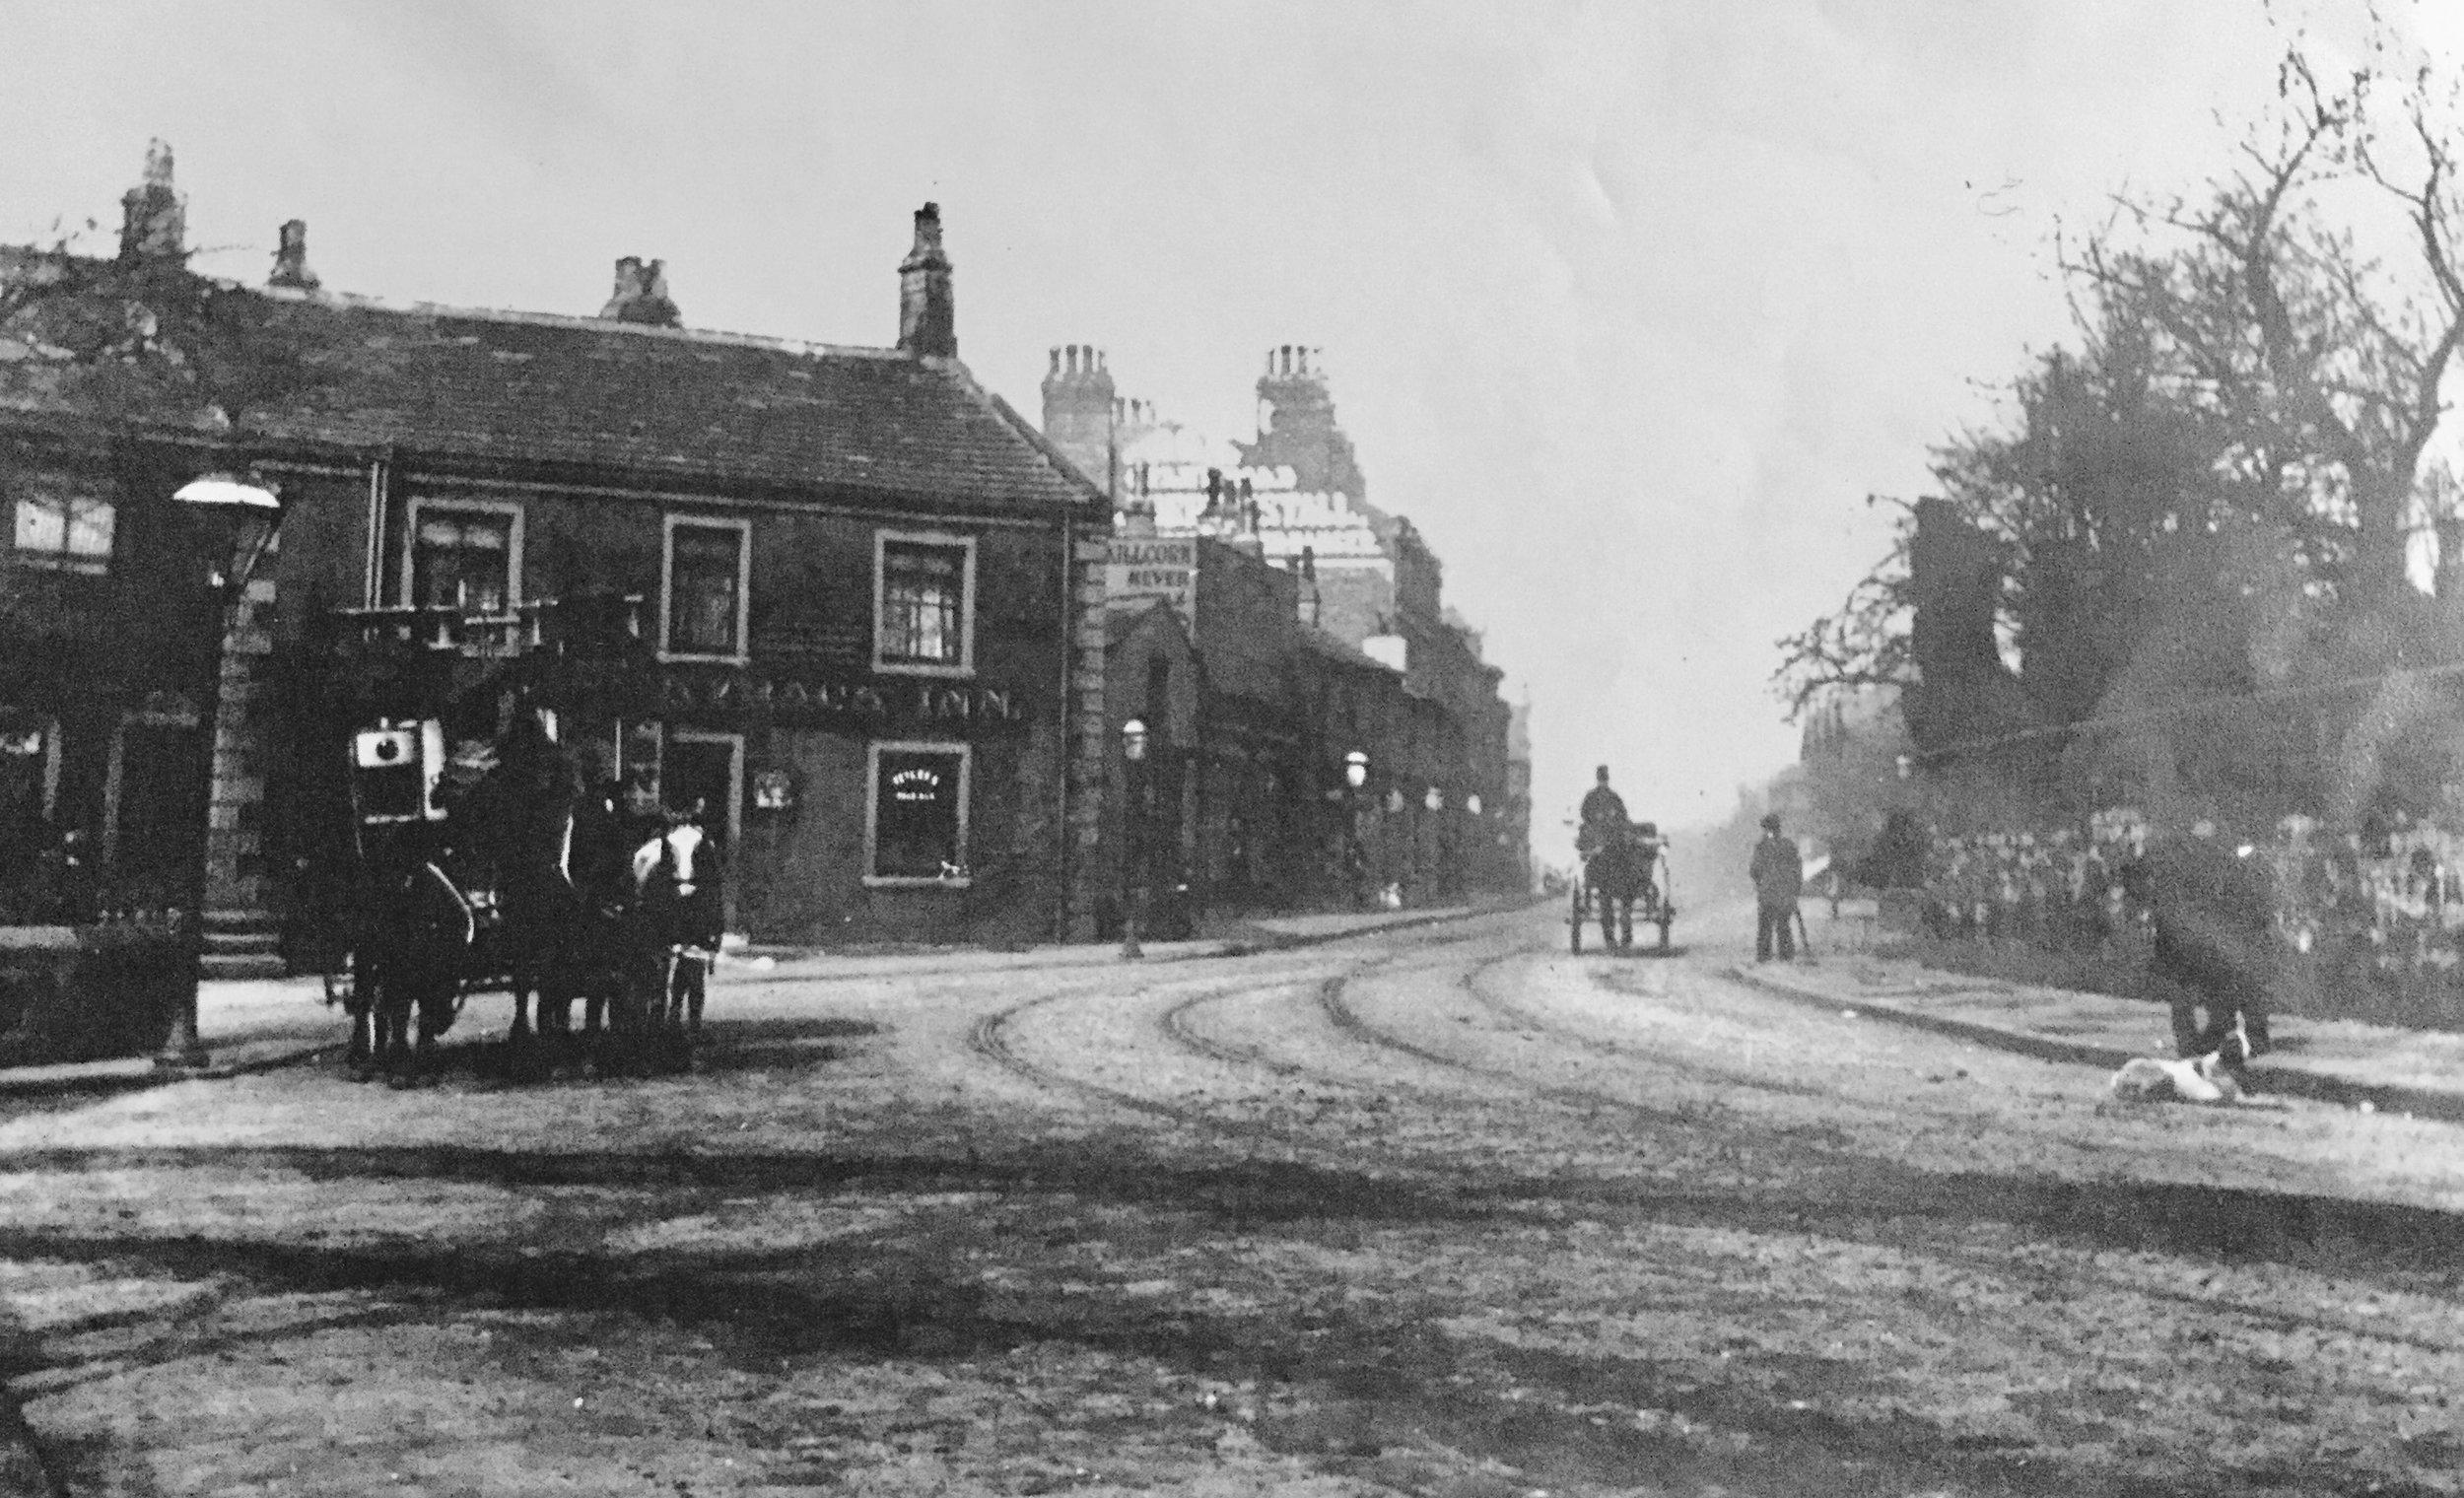 Skyrack Inn, circa 1890